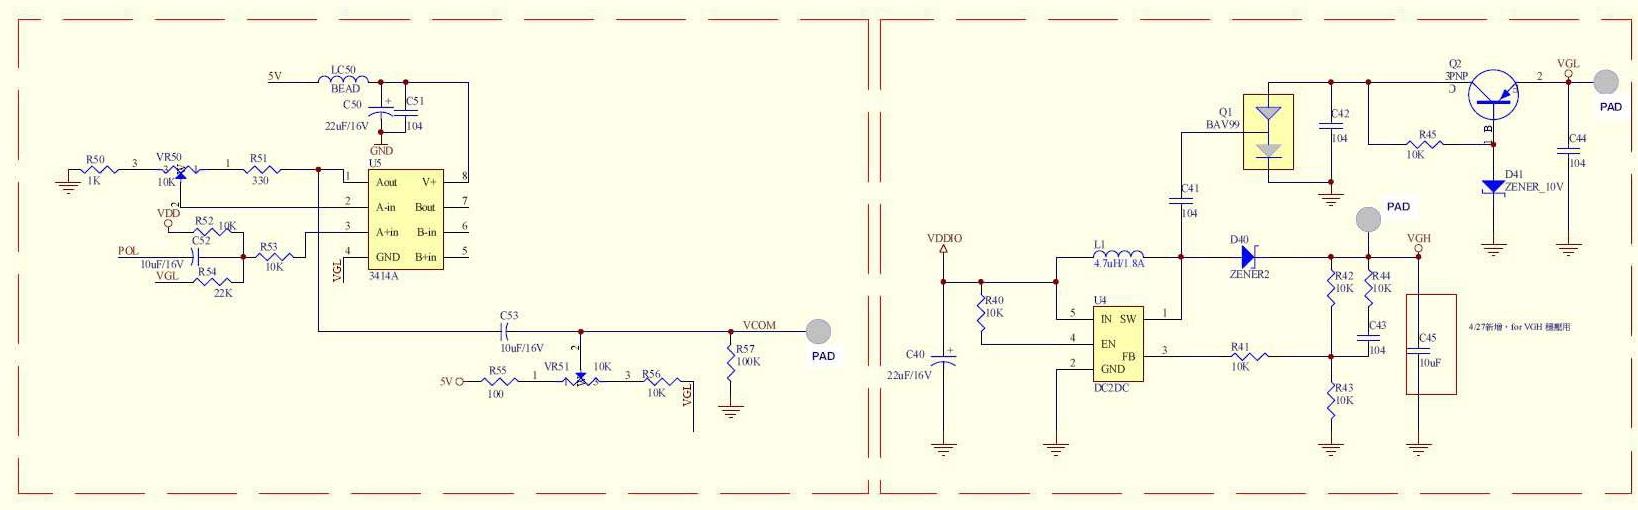 Lcd Circuit Page 3 Light Laser Led Circuits 6 Nextgr Drivers Bias